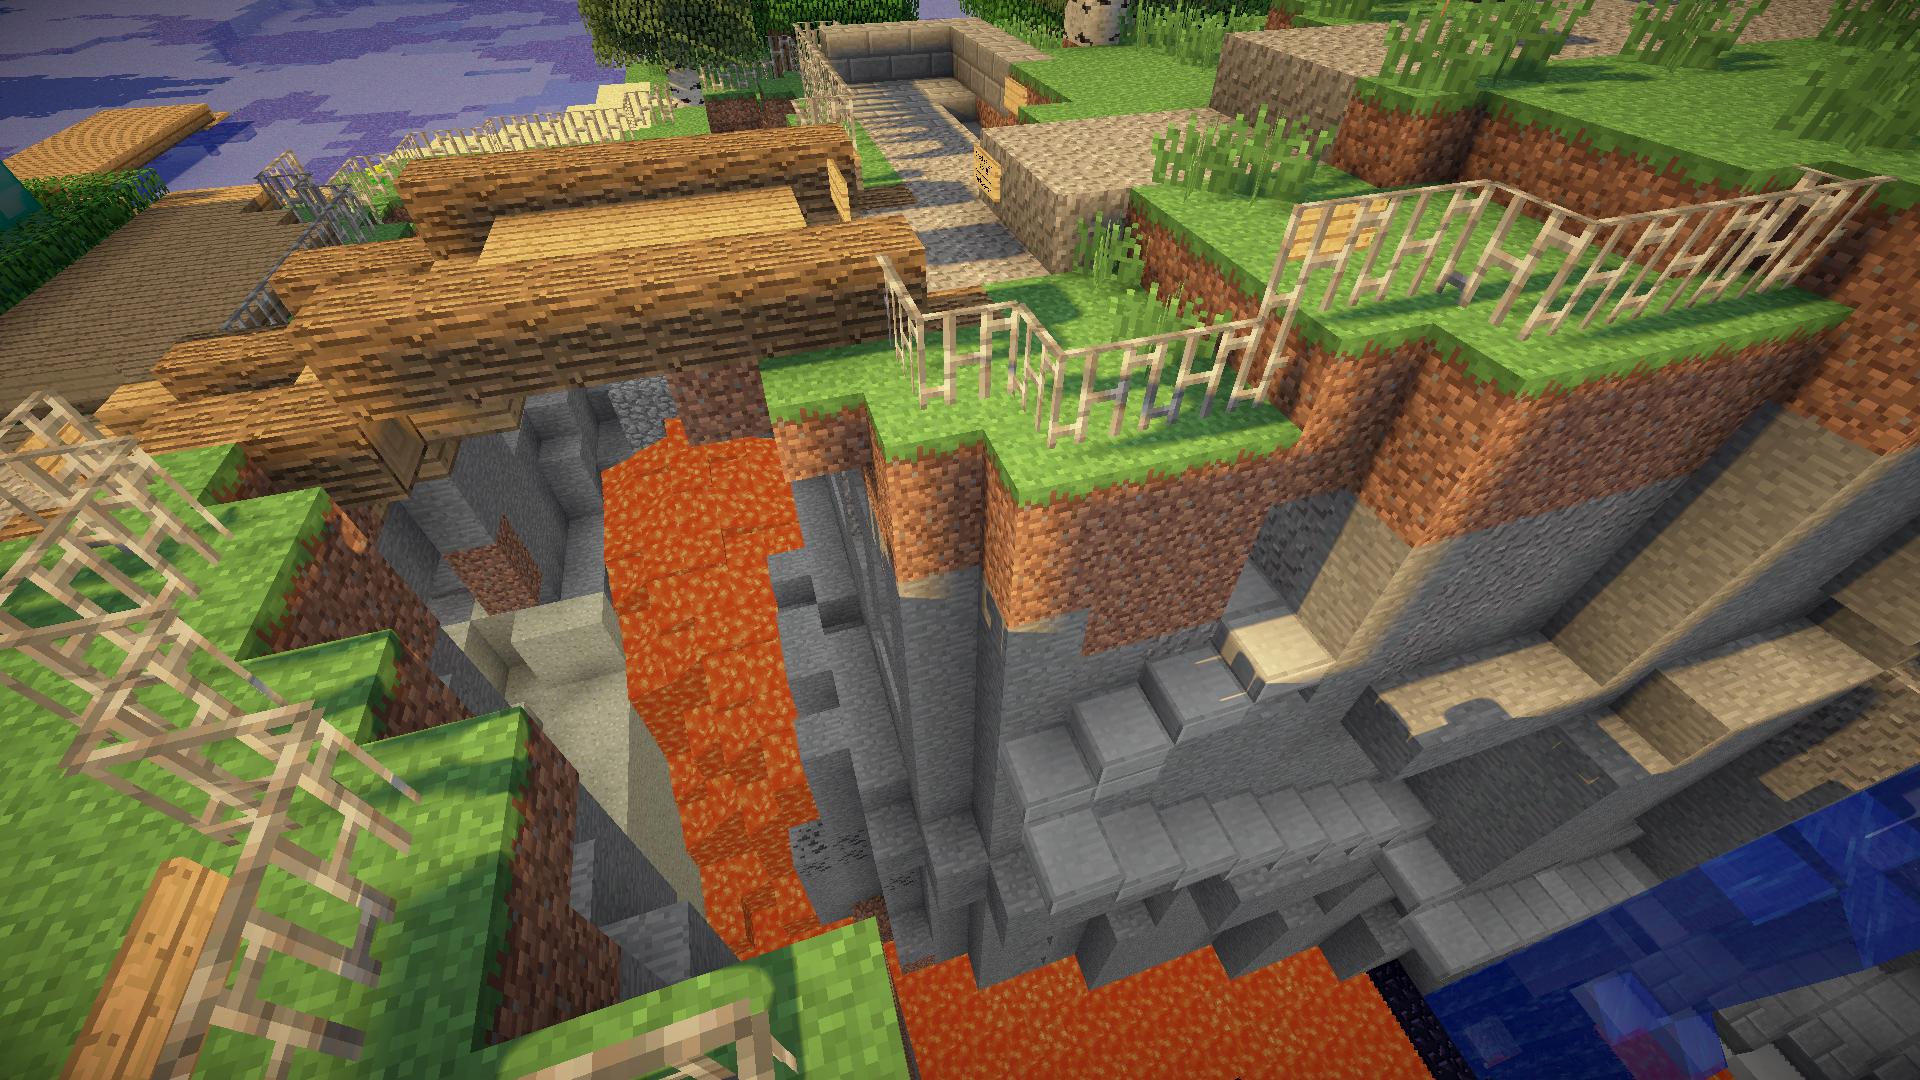 Skins Minecraft populaires | NameMC